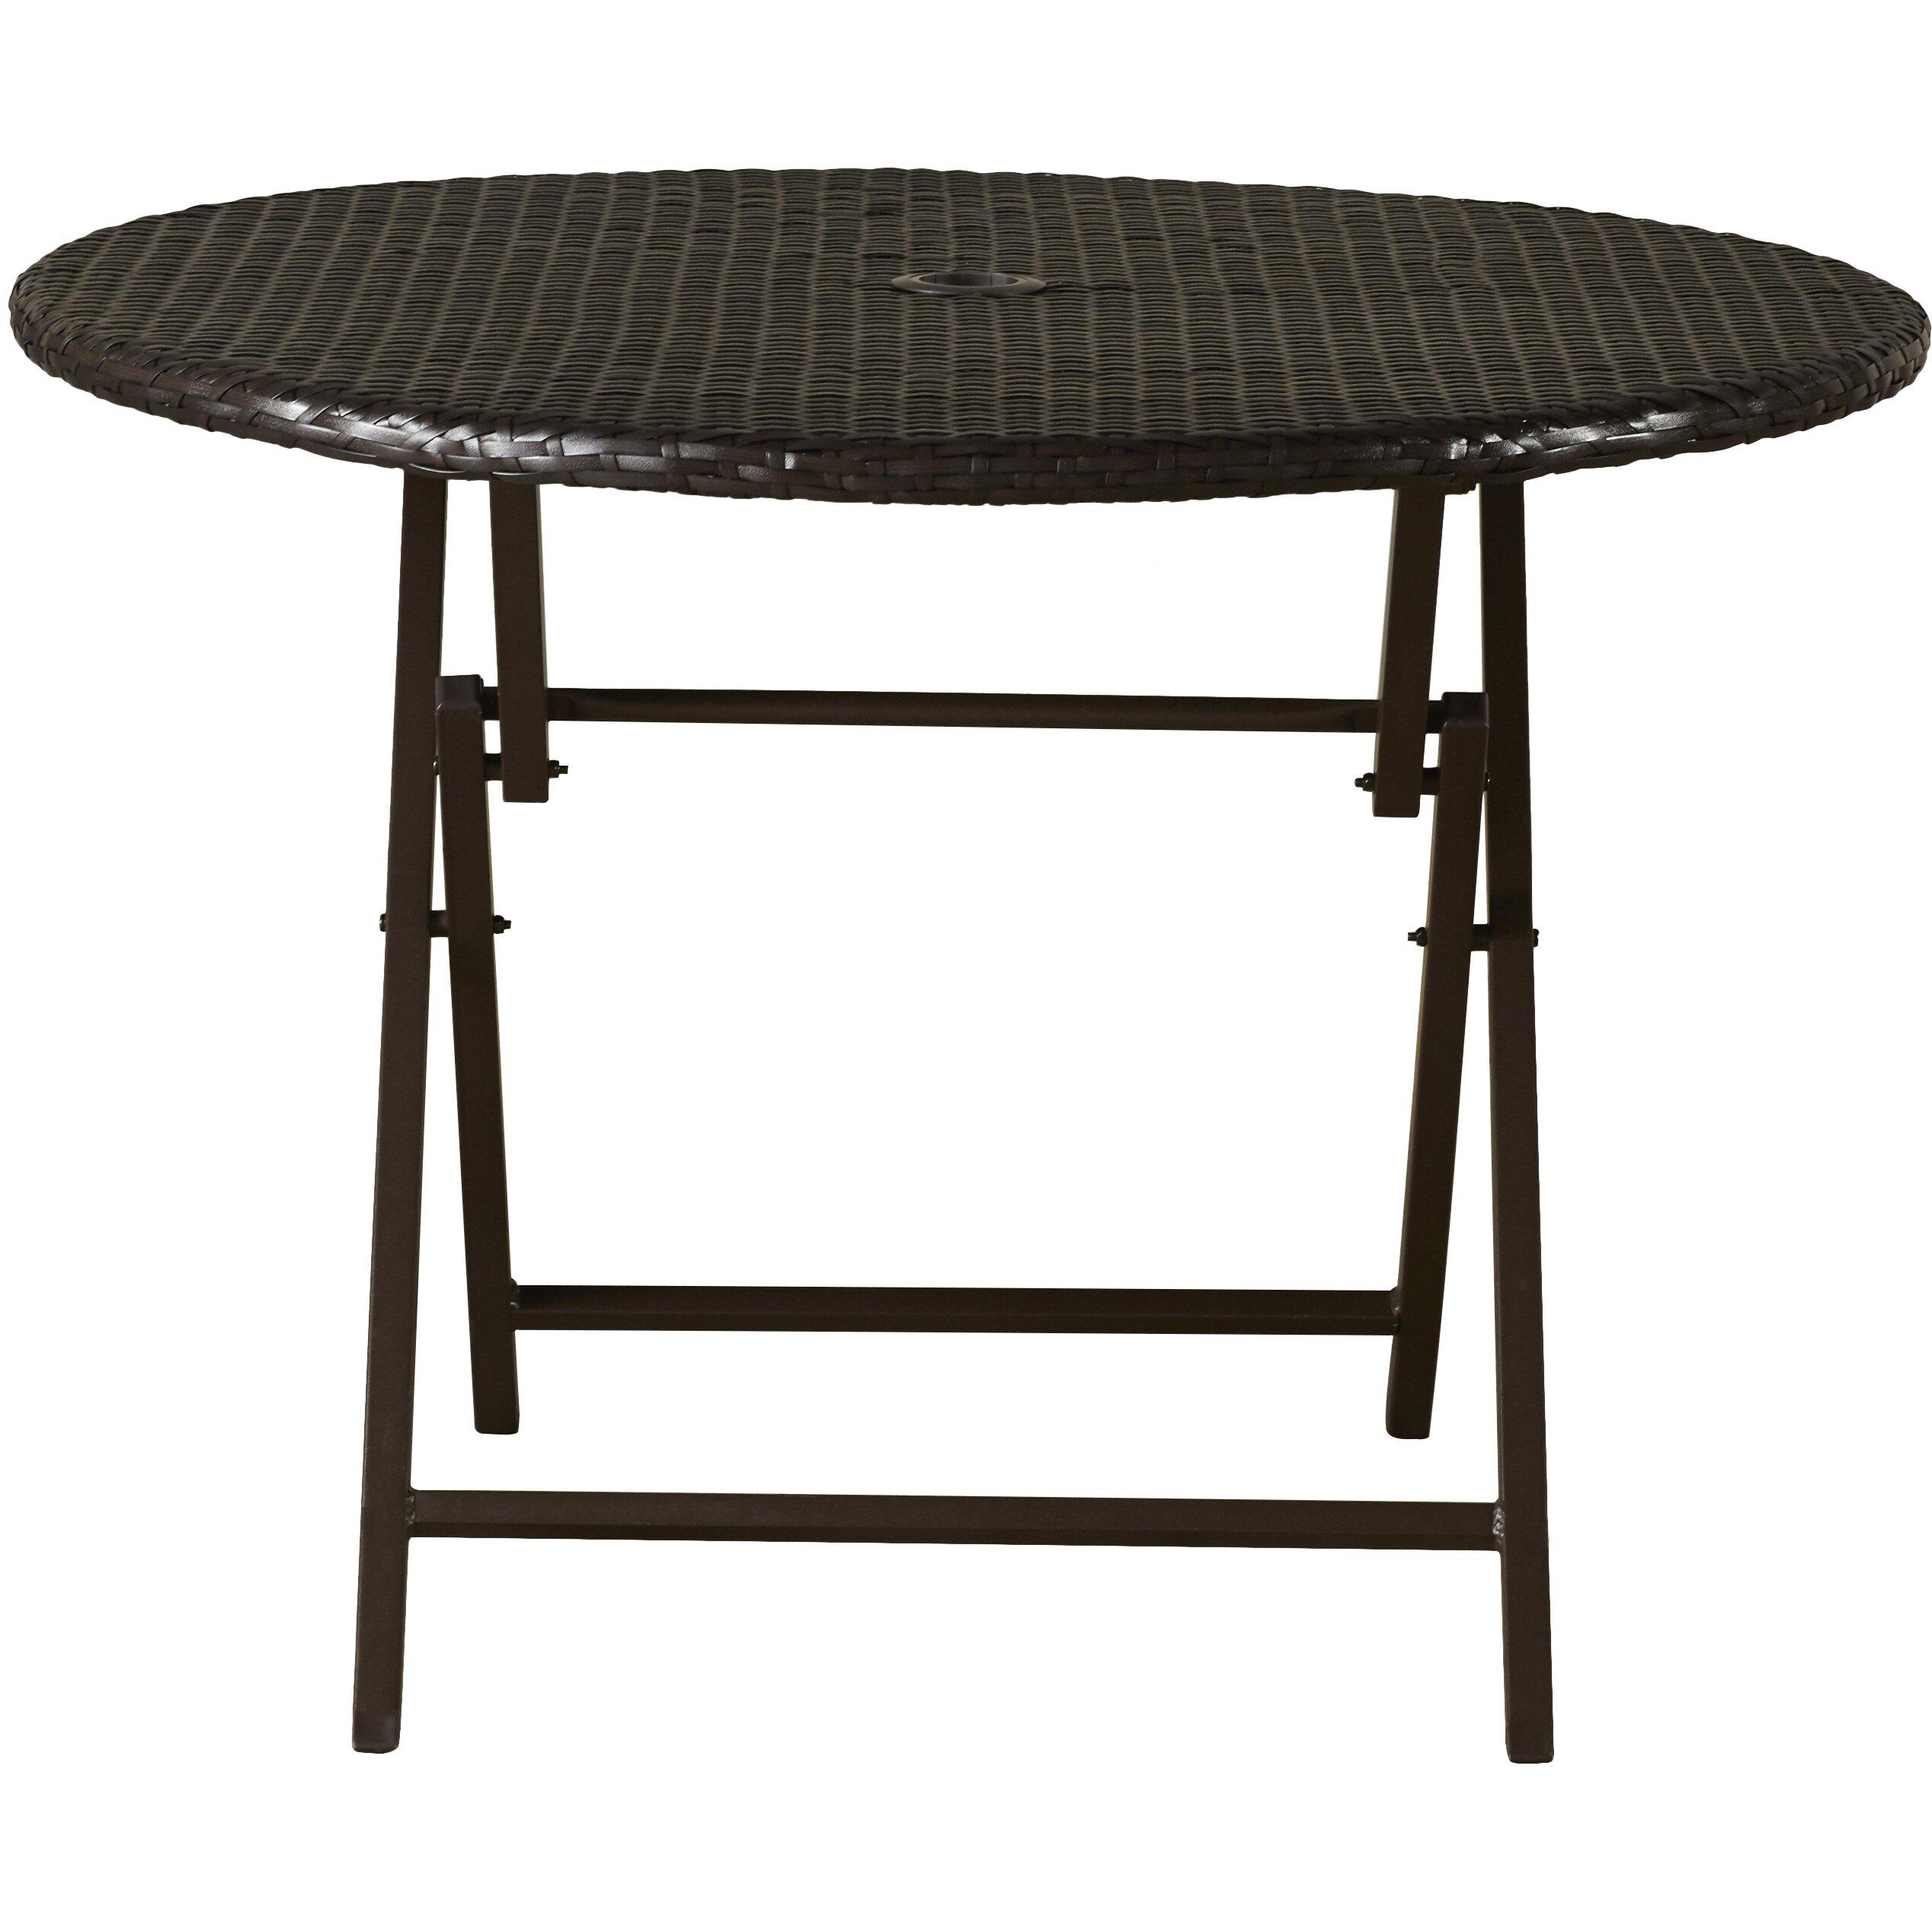 Brayden Studio Crosson Outdoor Wicker Dining Table